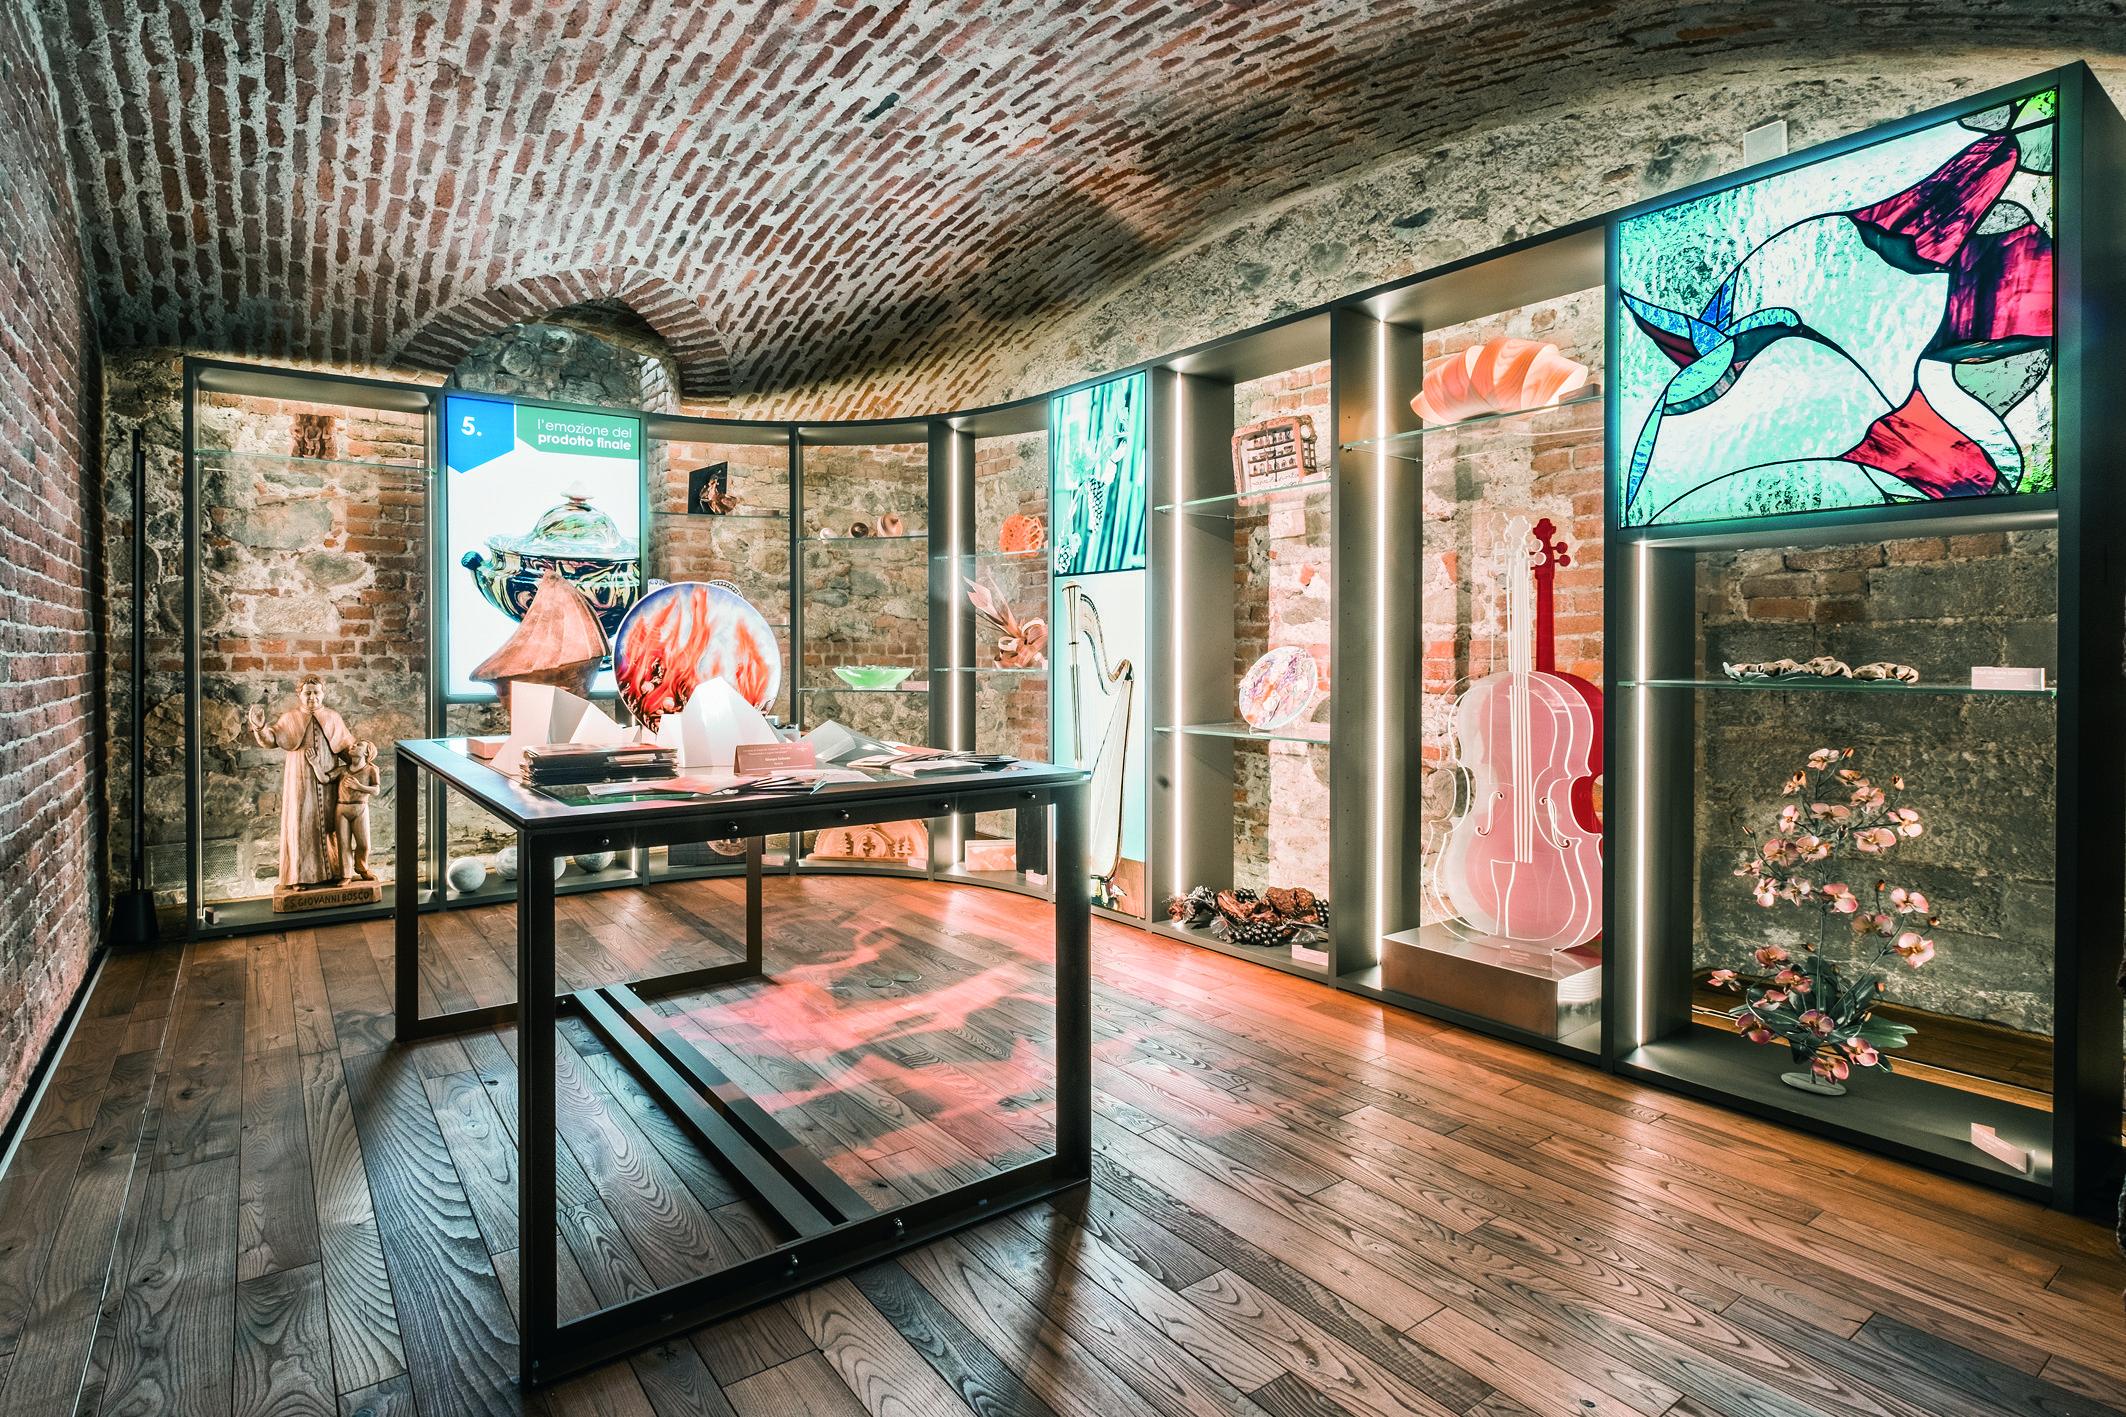 Confartigianato Cuneo | Exhibit | Agenzia di Comunicazione EGO NewCom